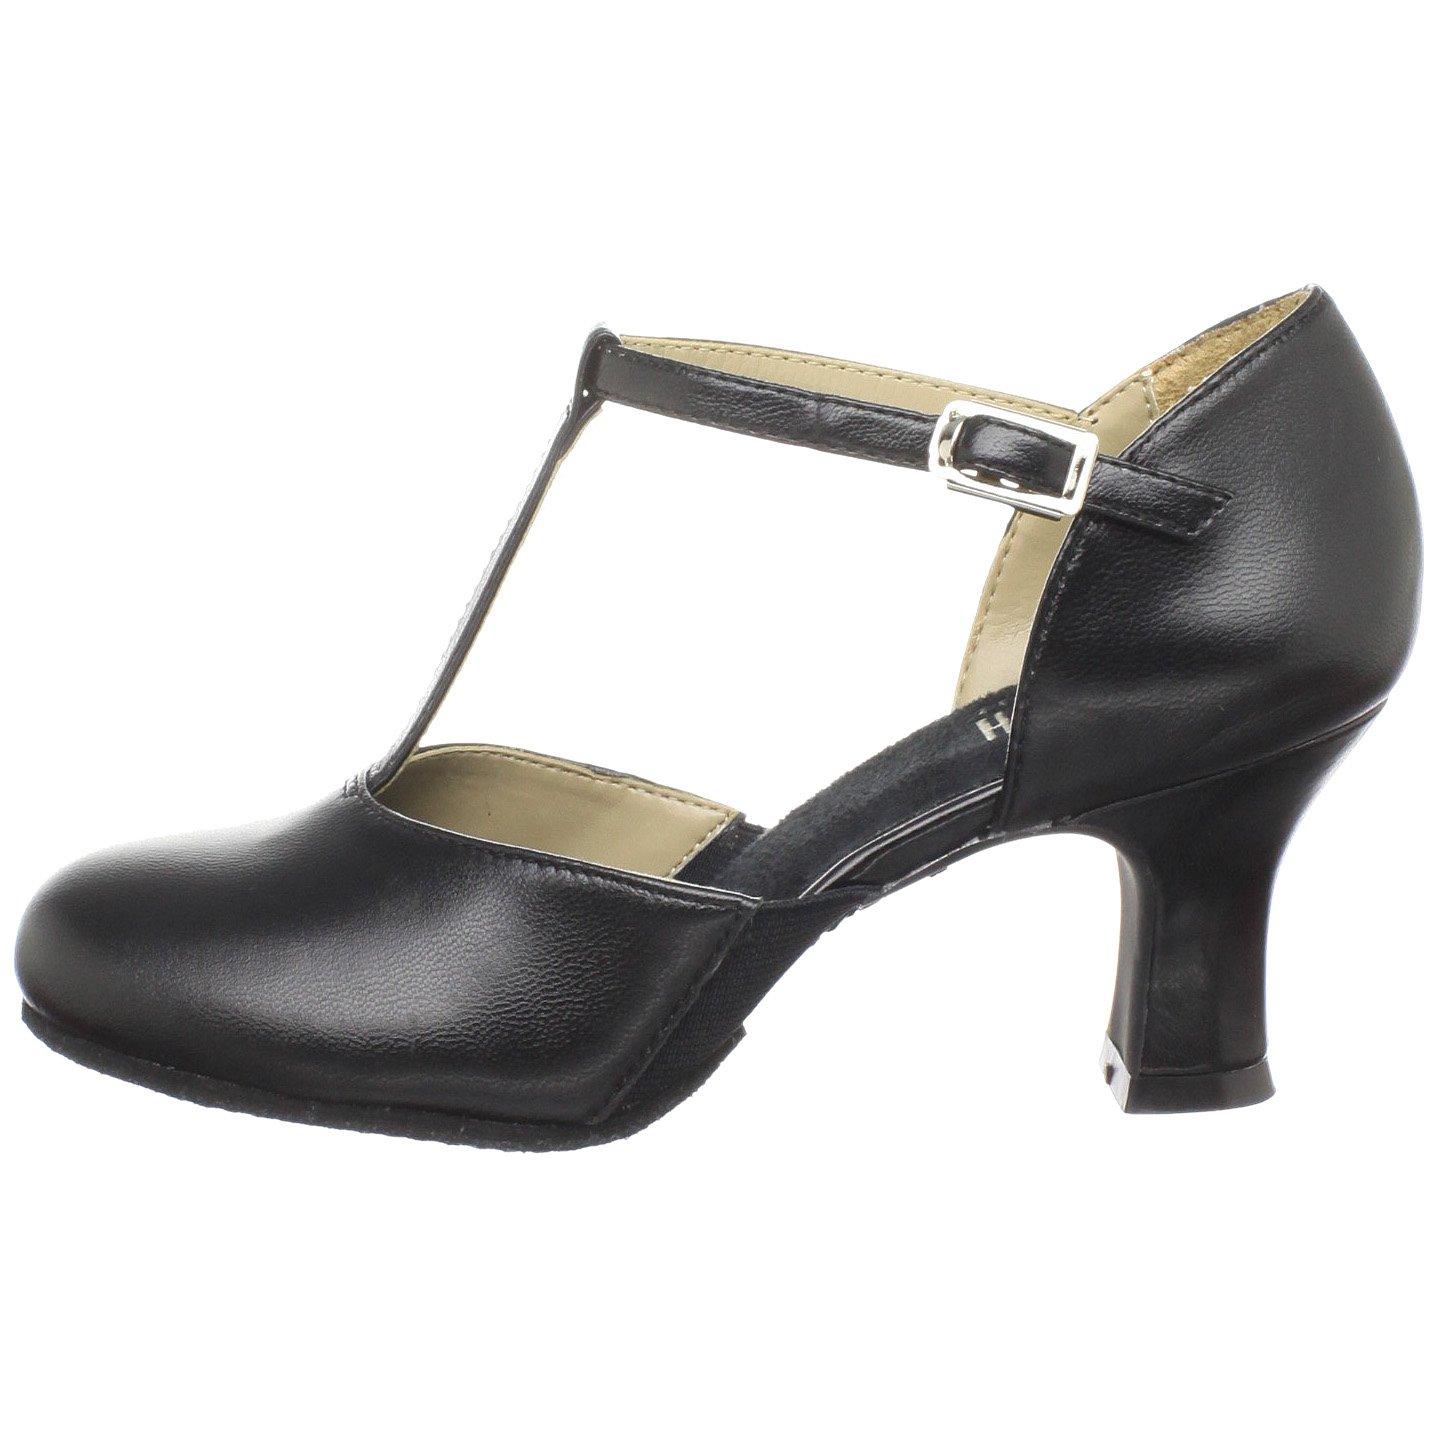 Bloch Dance Women's Split 9.5 Flex Character Shoe B0041HZ3AK 9.5 Split X(Medium) US|Black d6b5a6